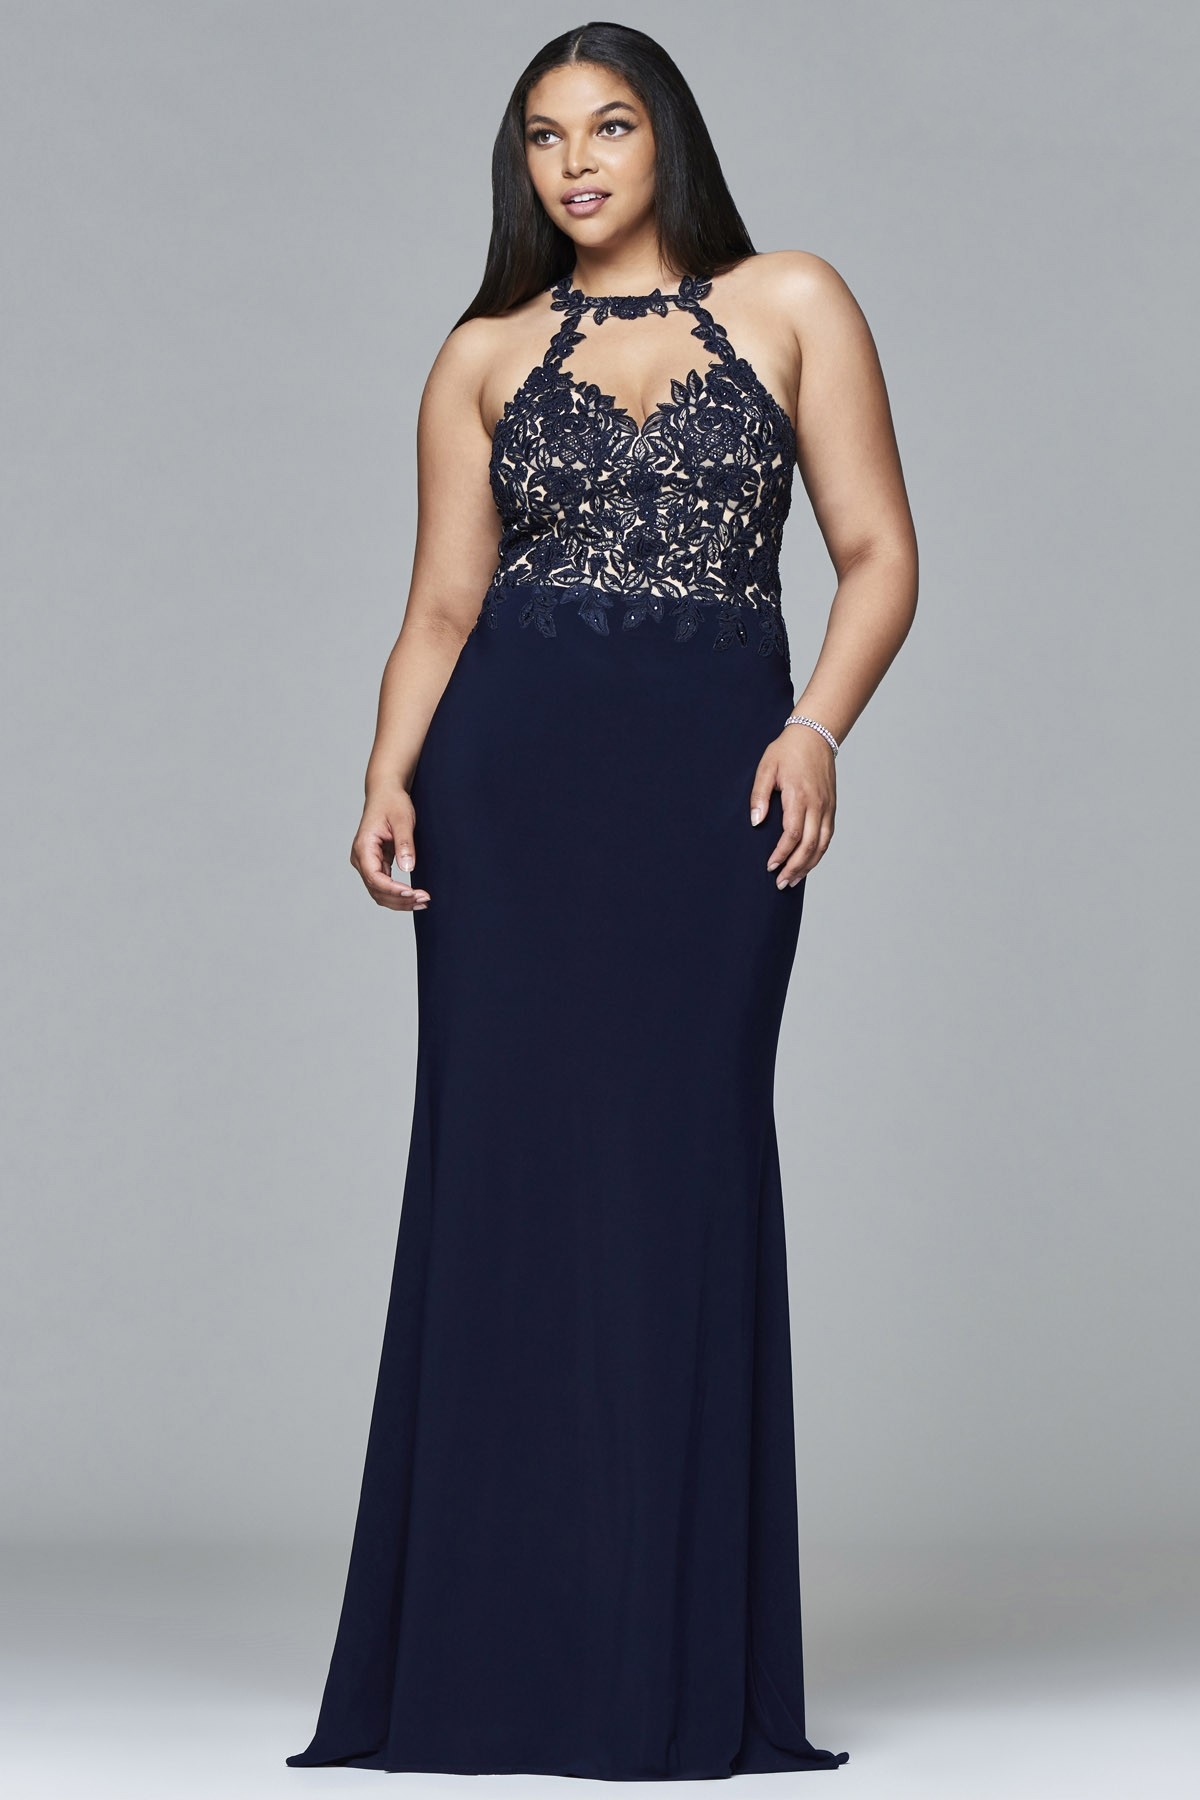 Faviana 9394 Stretch Jersey Long Plus Size Dress